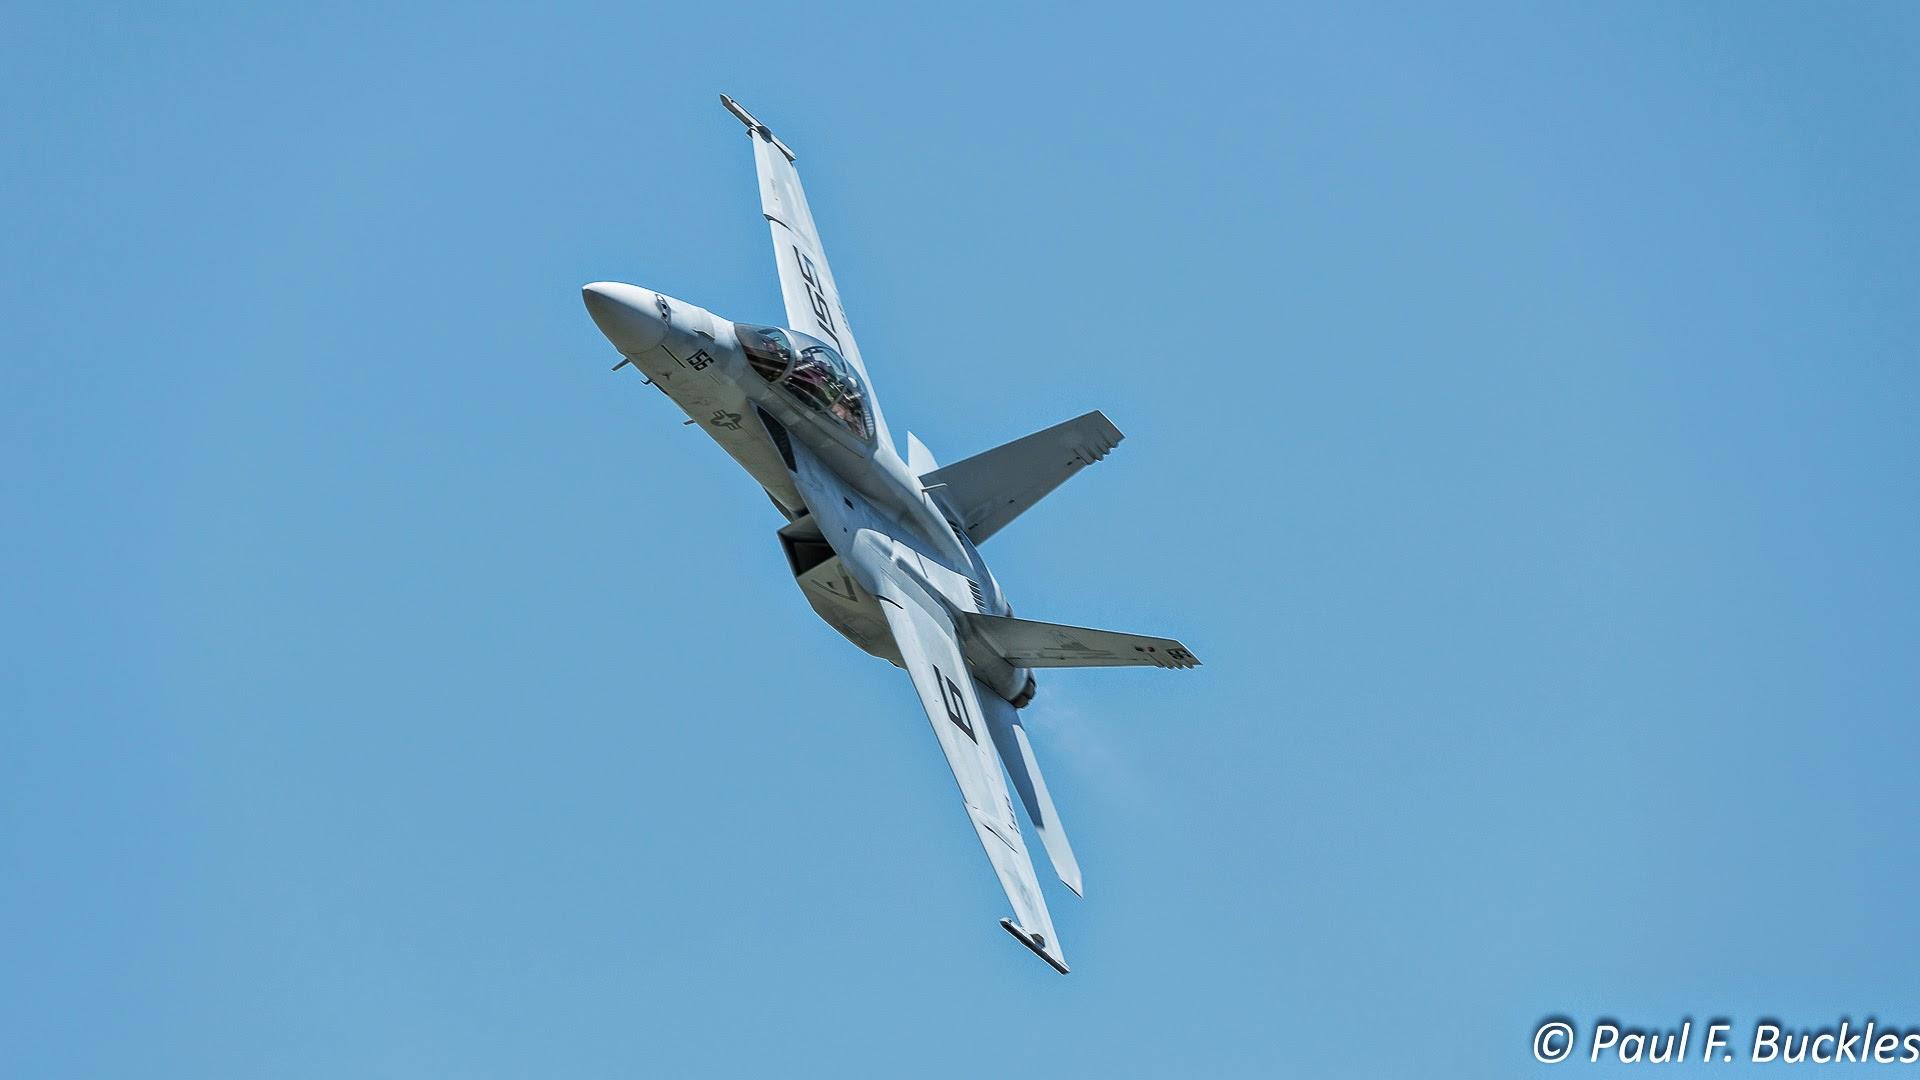 Navy F/A 18 Super Hornet at the Vectren Dayton Airshow 2016.